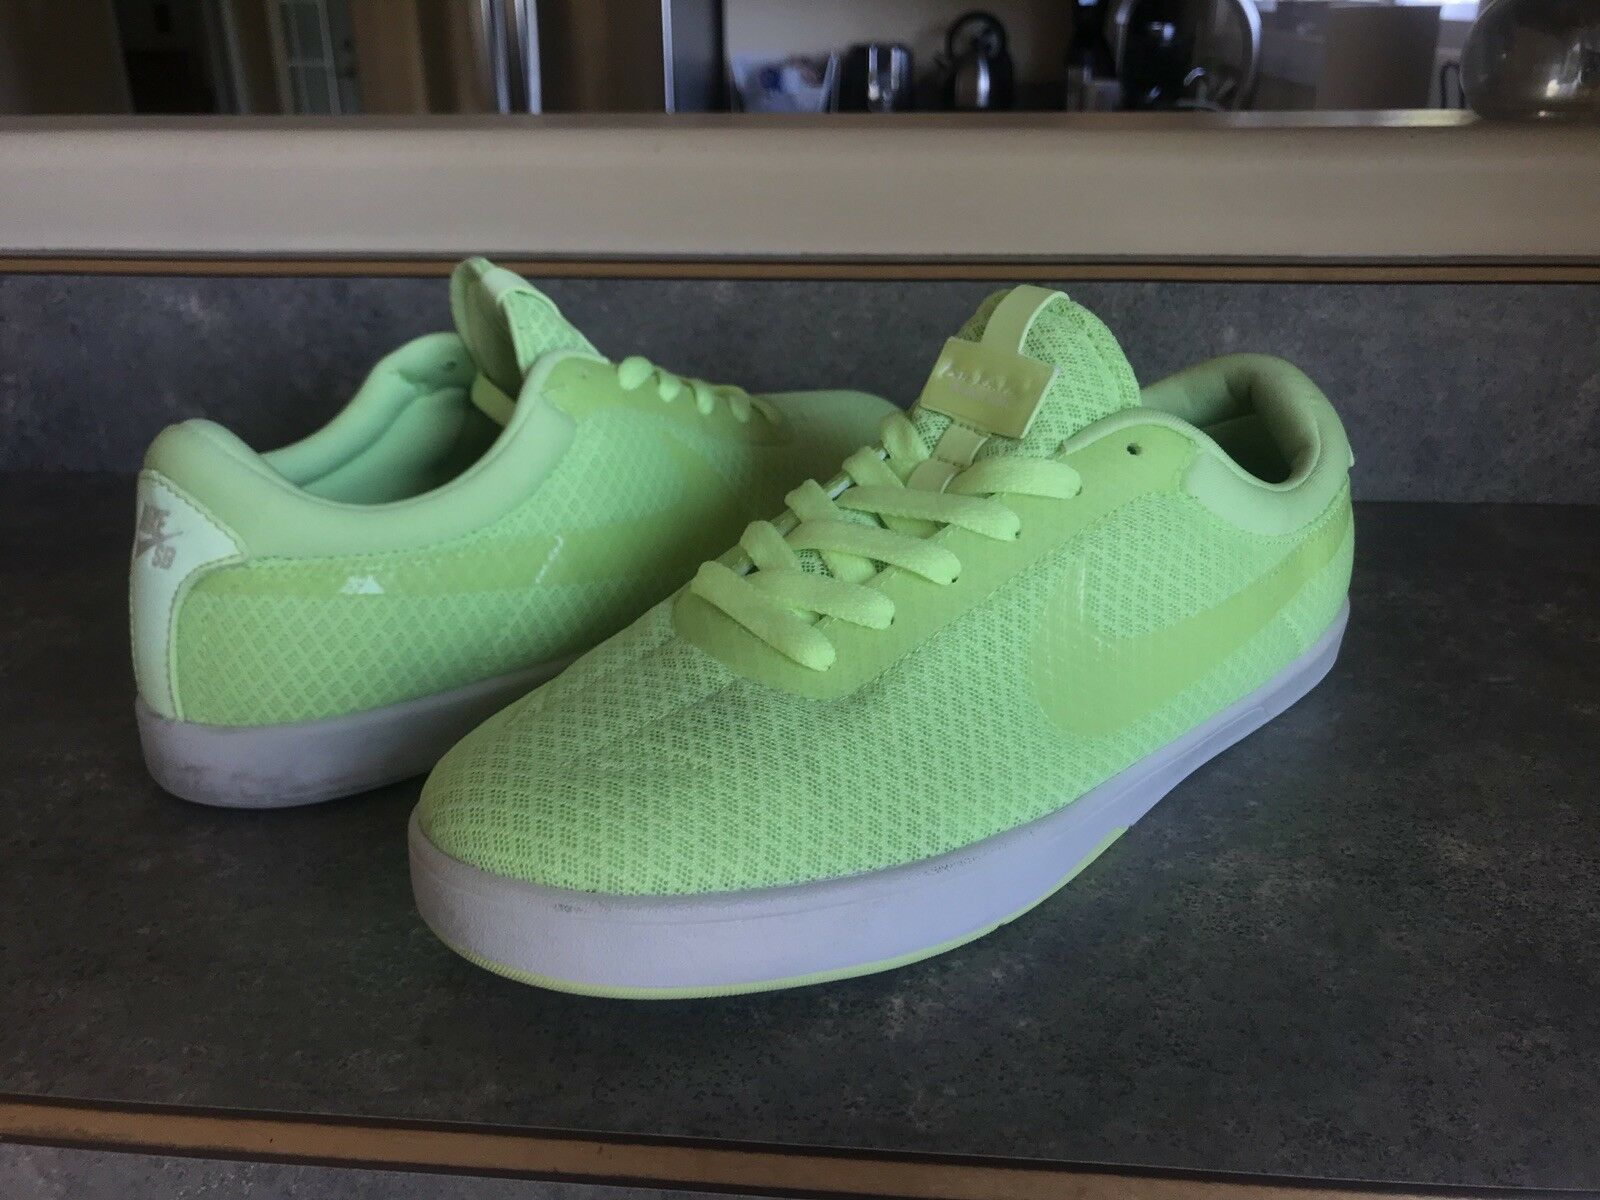 05f111376fcc 8.5 Nike Koston 1 Rare neon green green green b759b2 - clothing ...